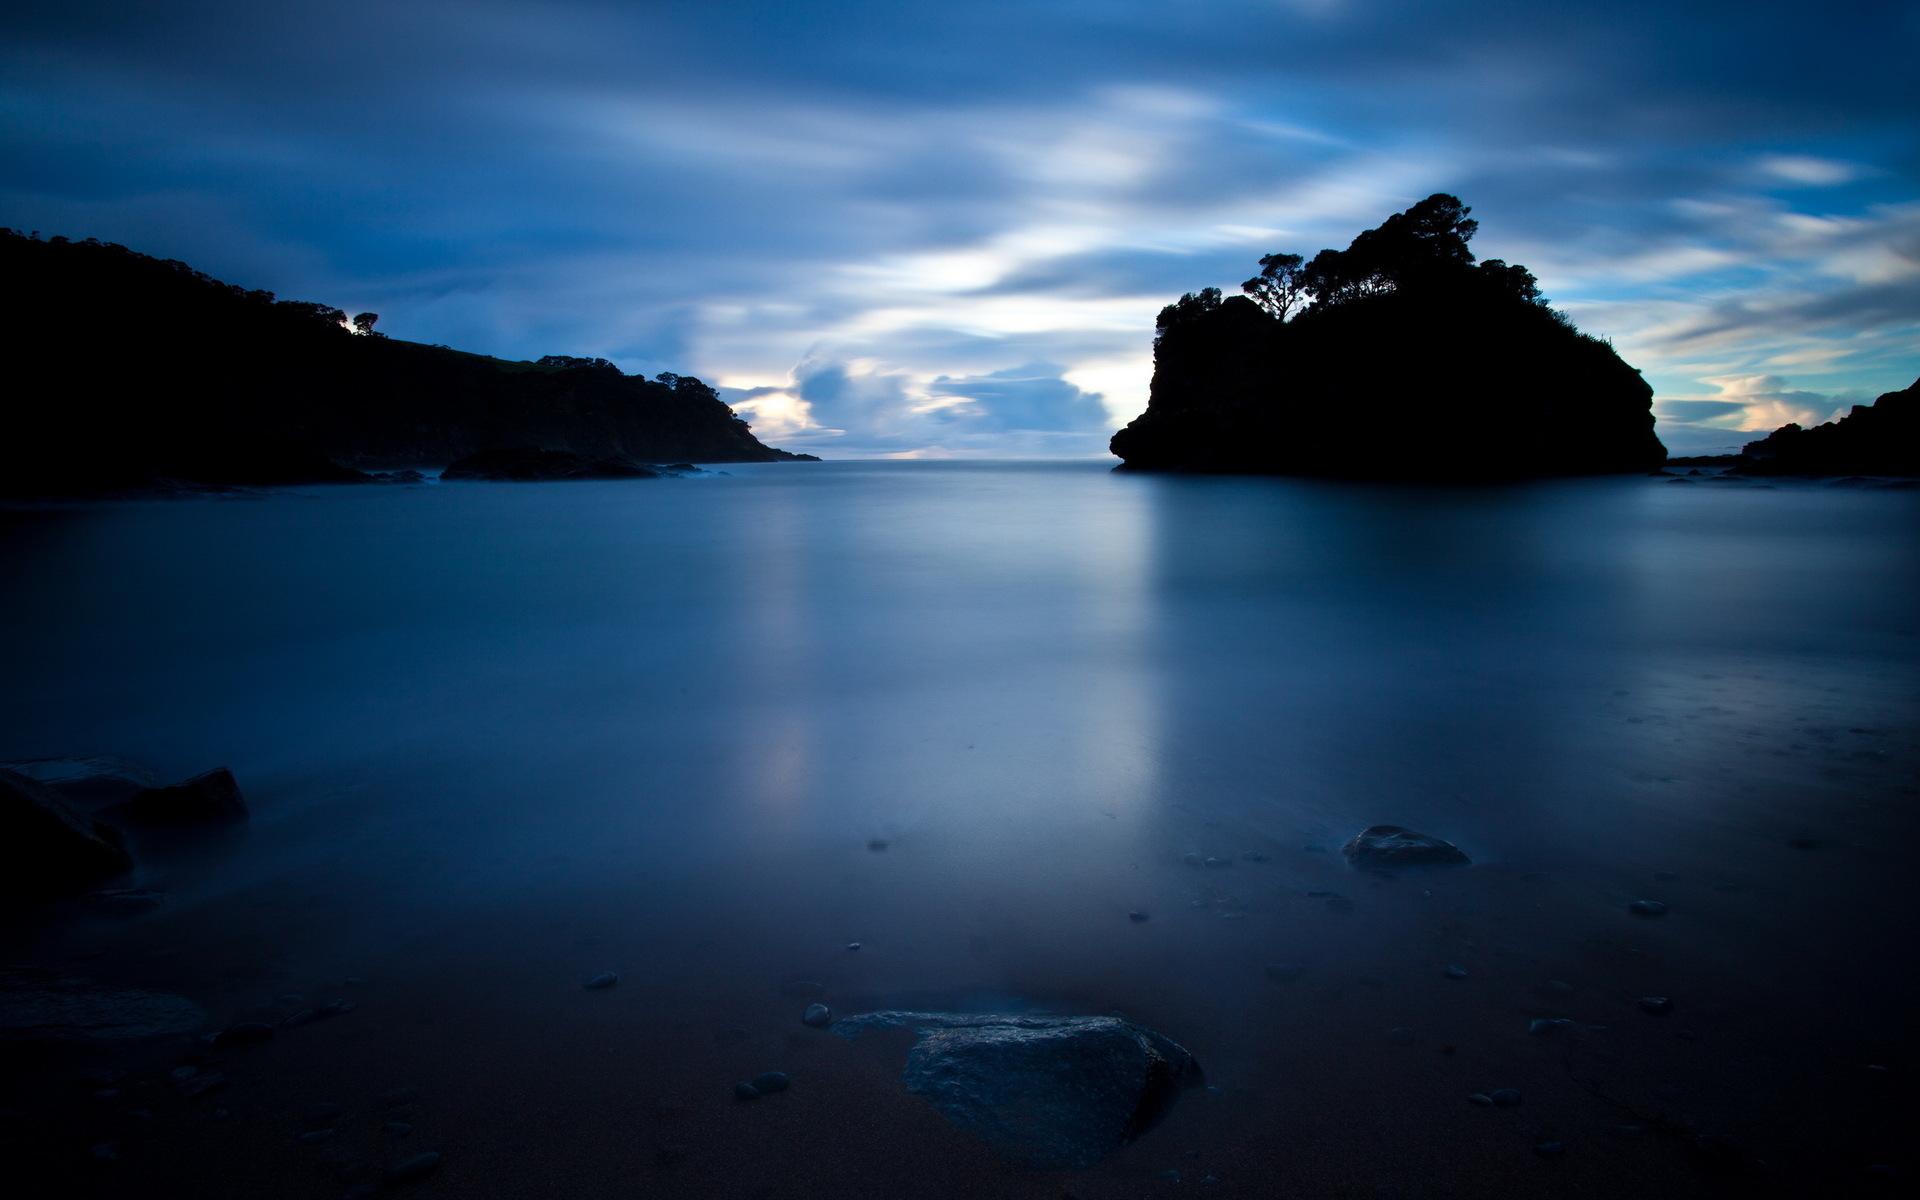 ocean landscape 32301